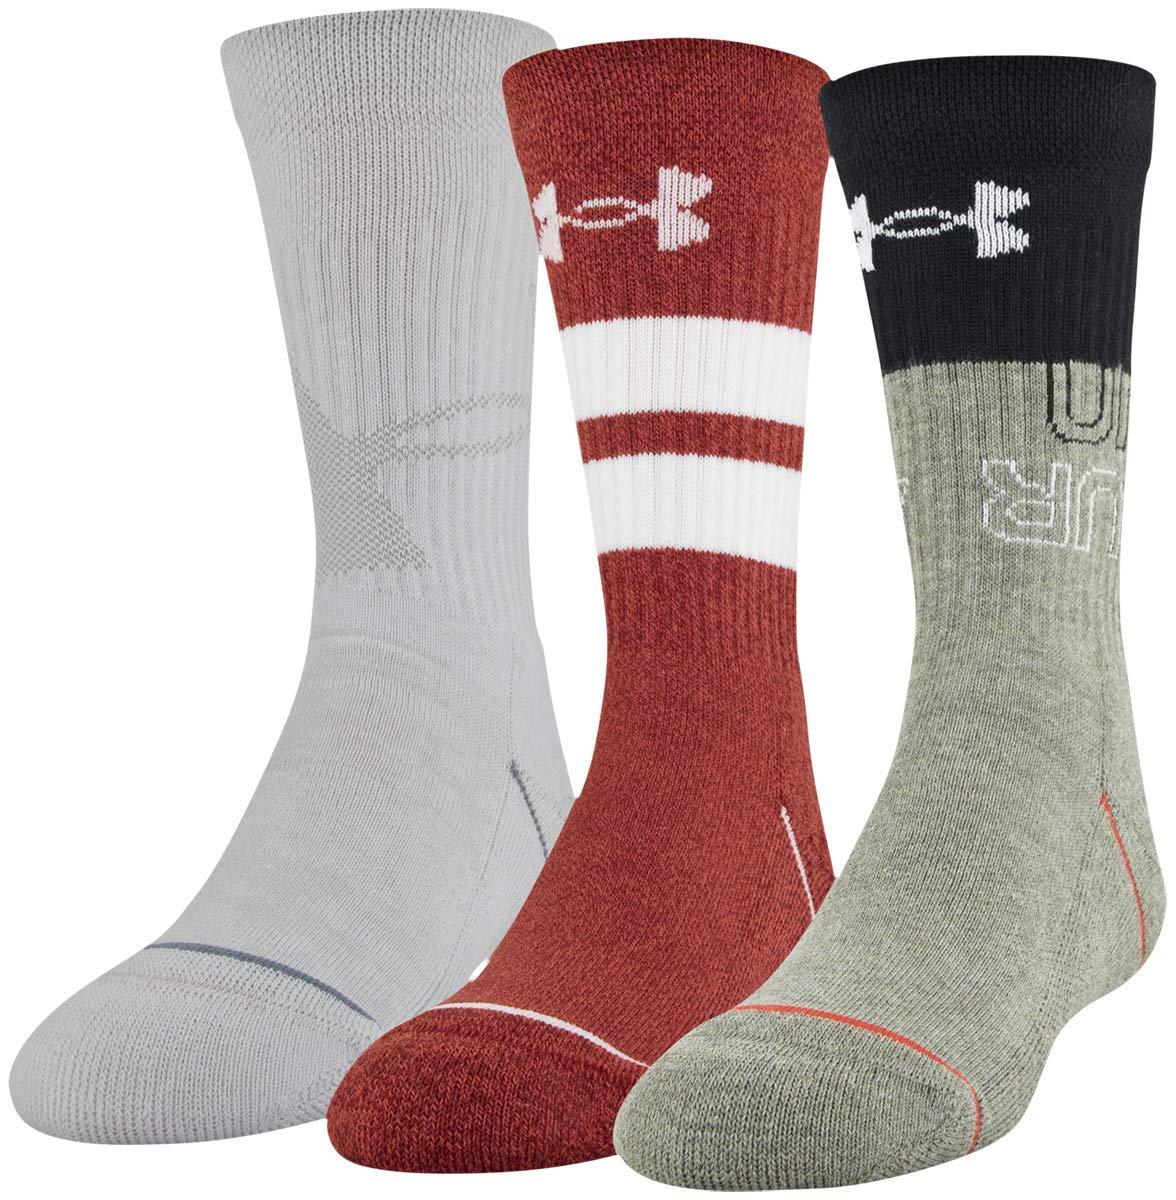 4Y New Under Armour Boys Phenom 5.0 3-Pack Crew Socks Size 13.5.K